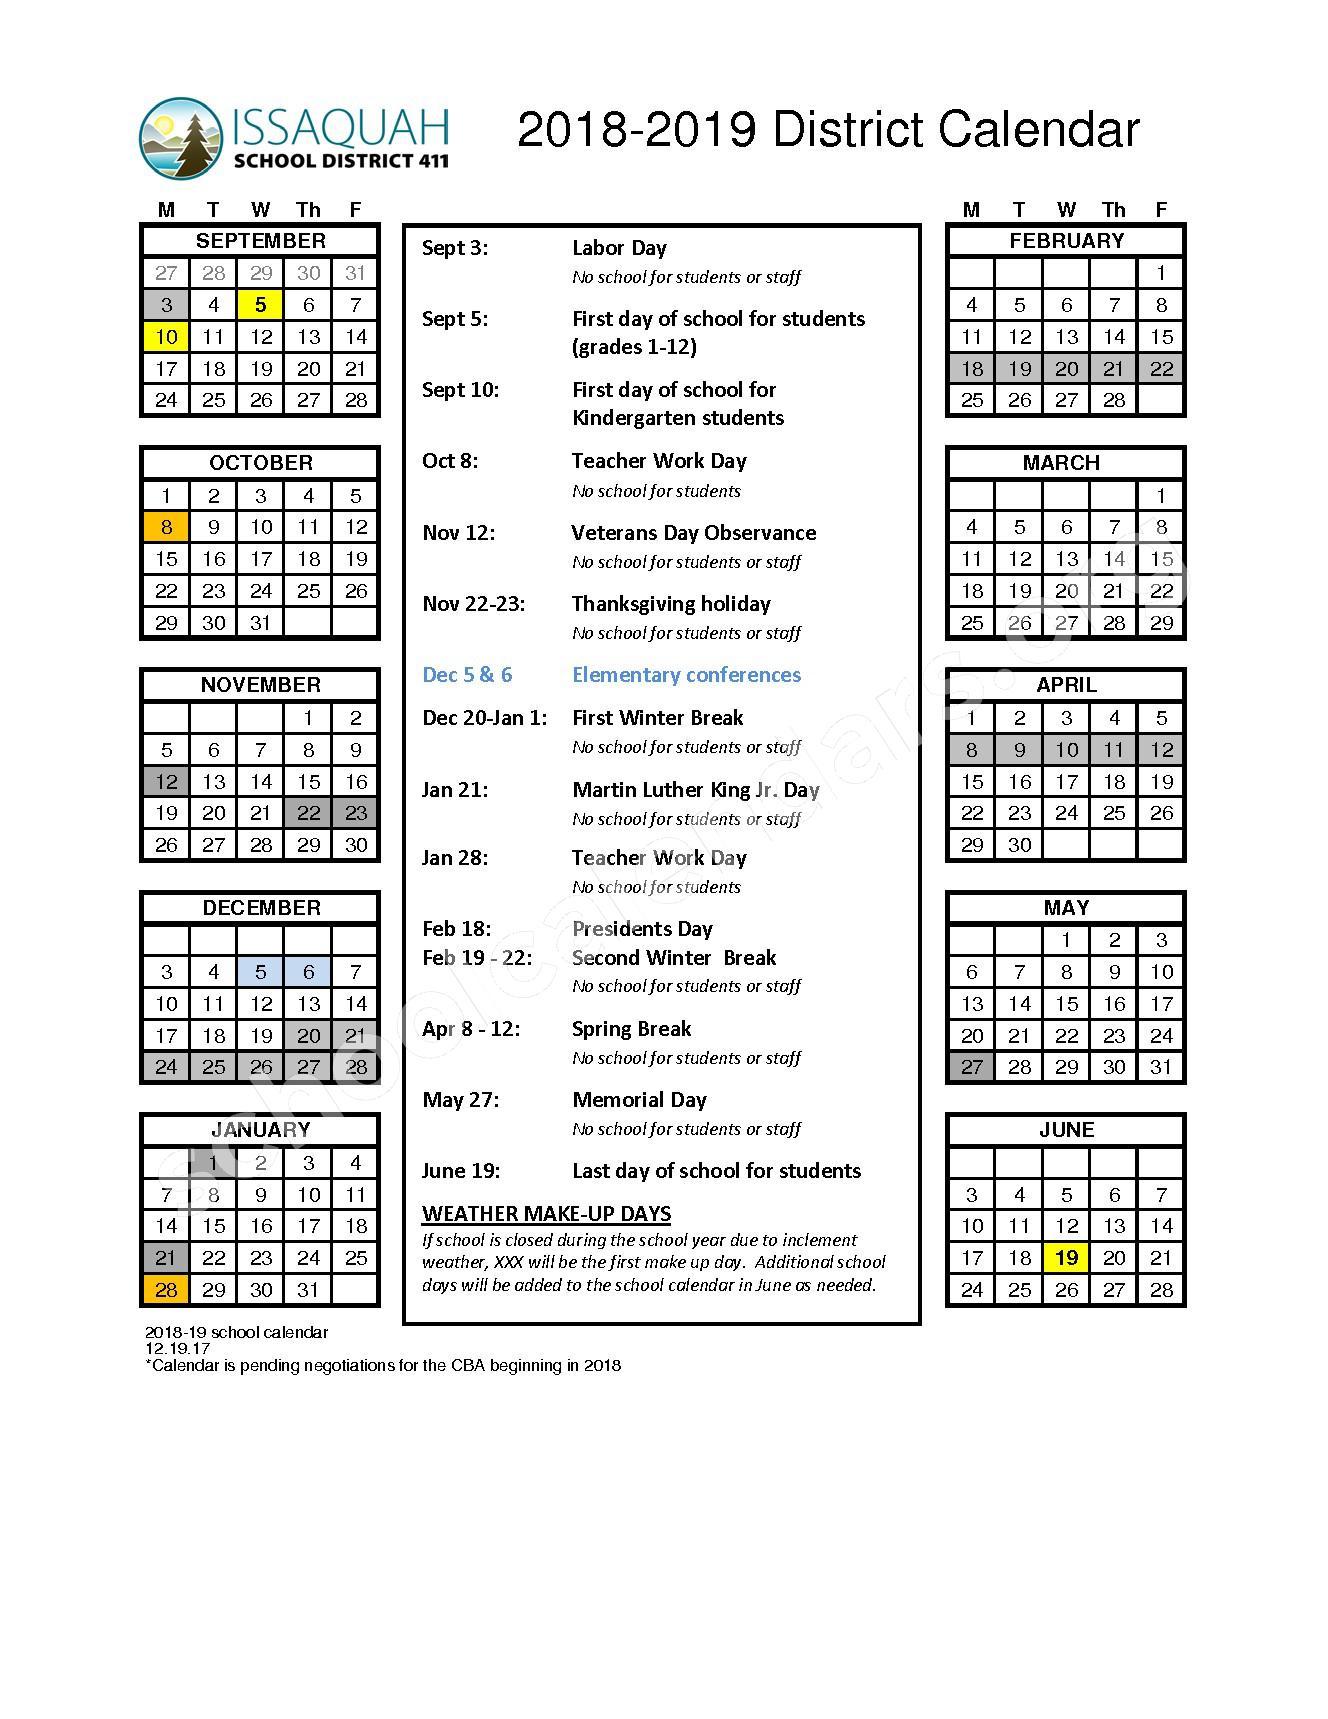 Apollo Elementary School Calendars Renton Wa